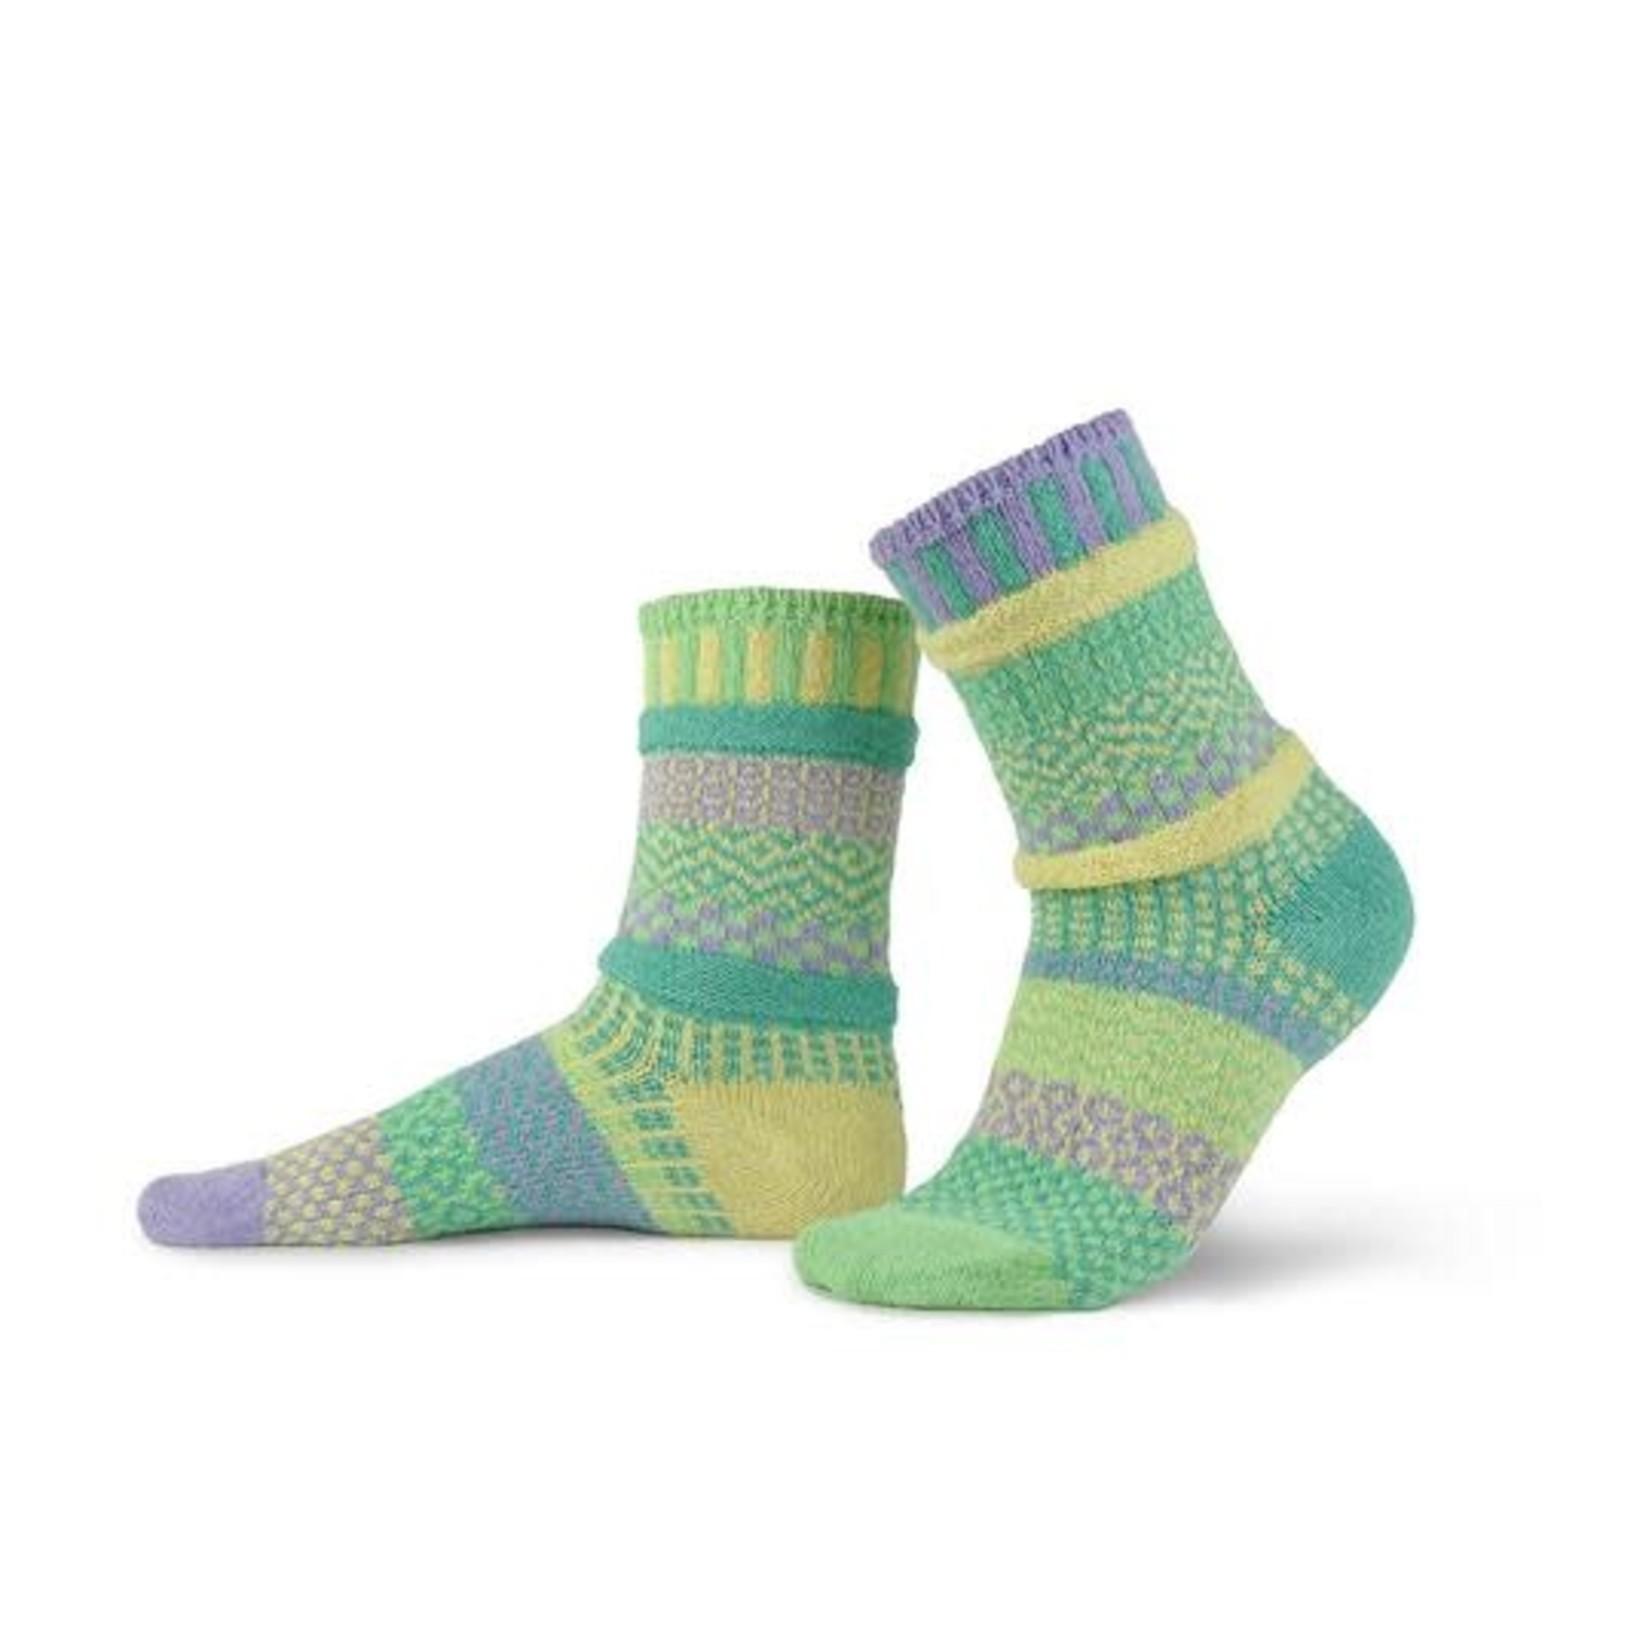 Solmates Chick-a-dee crew socks